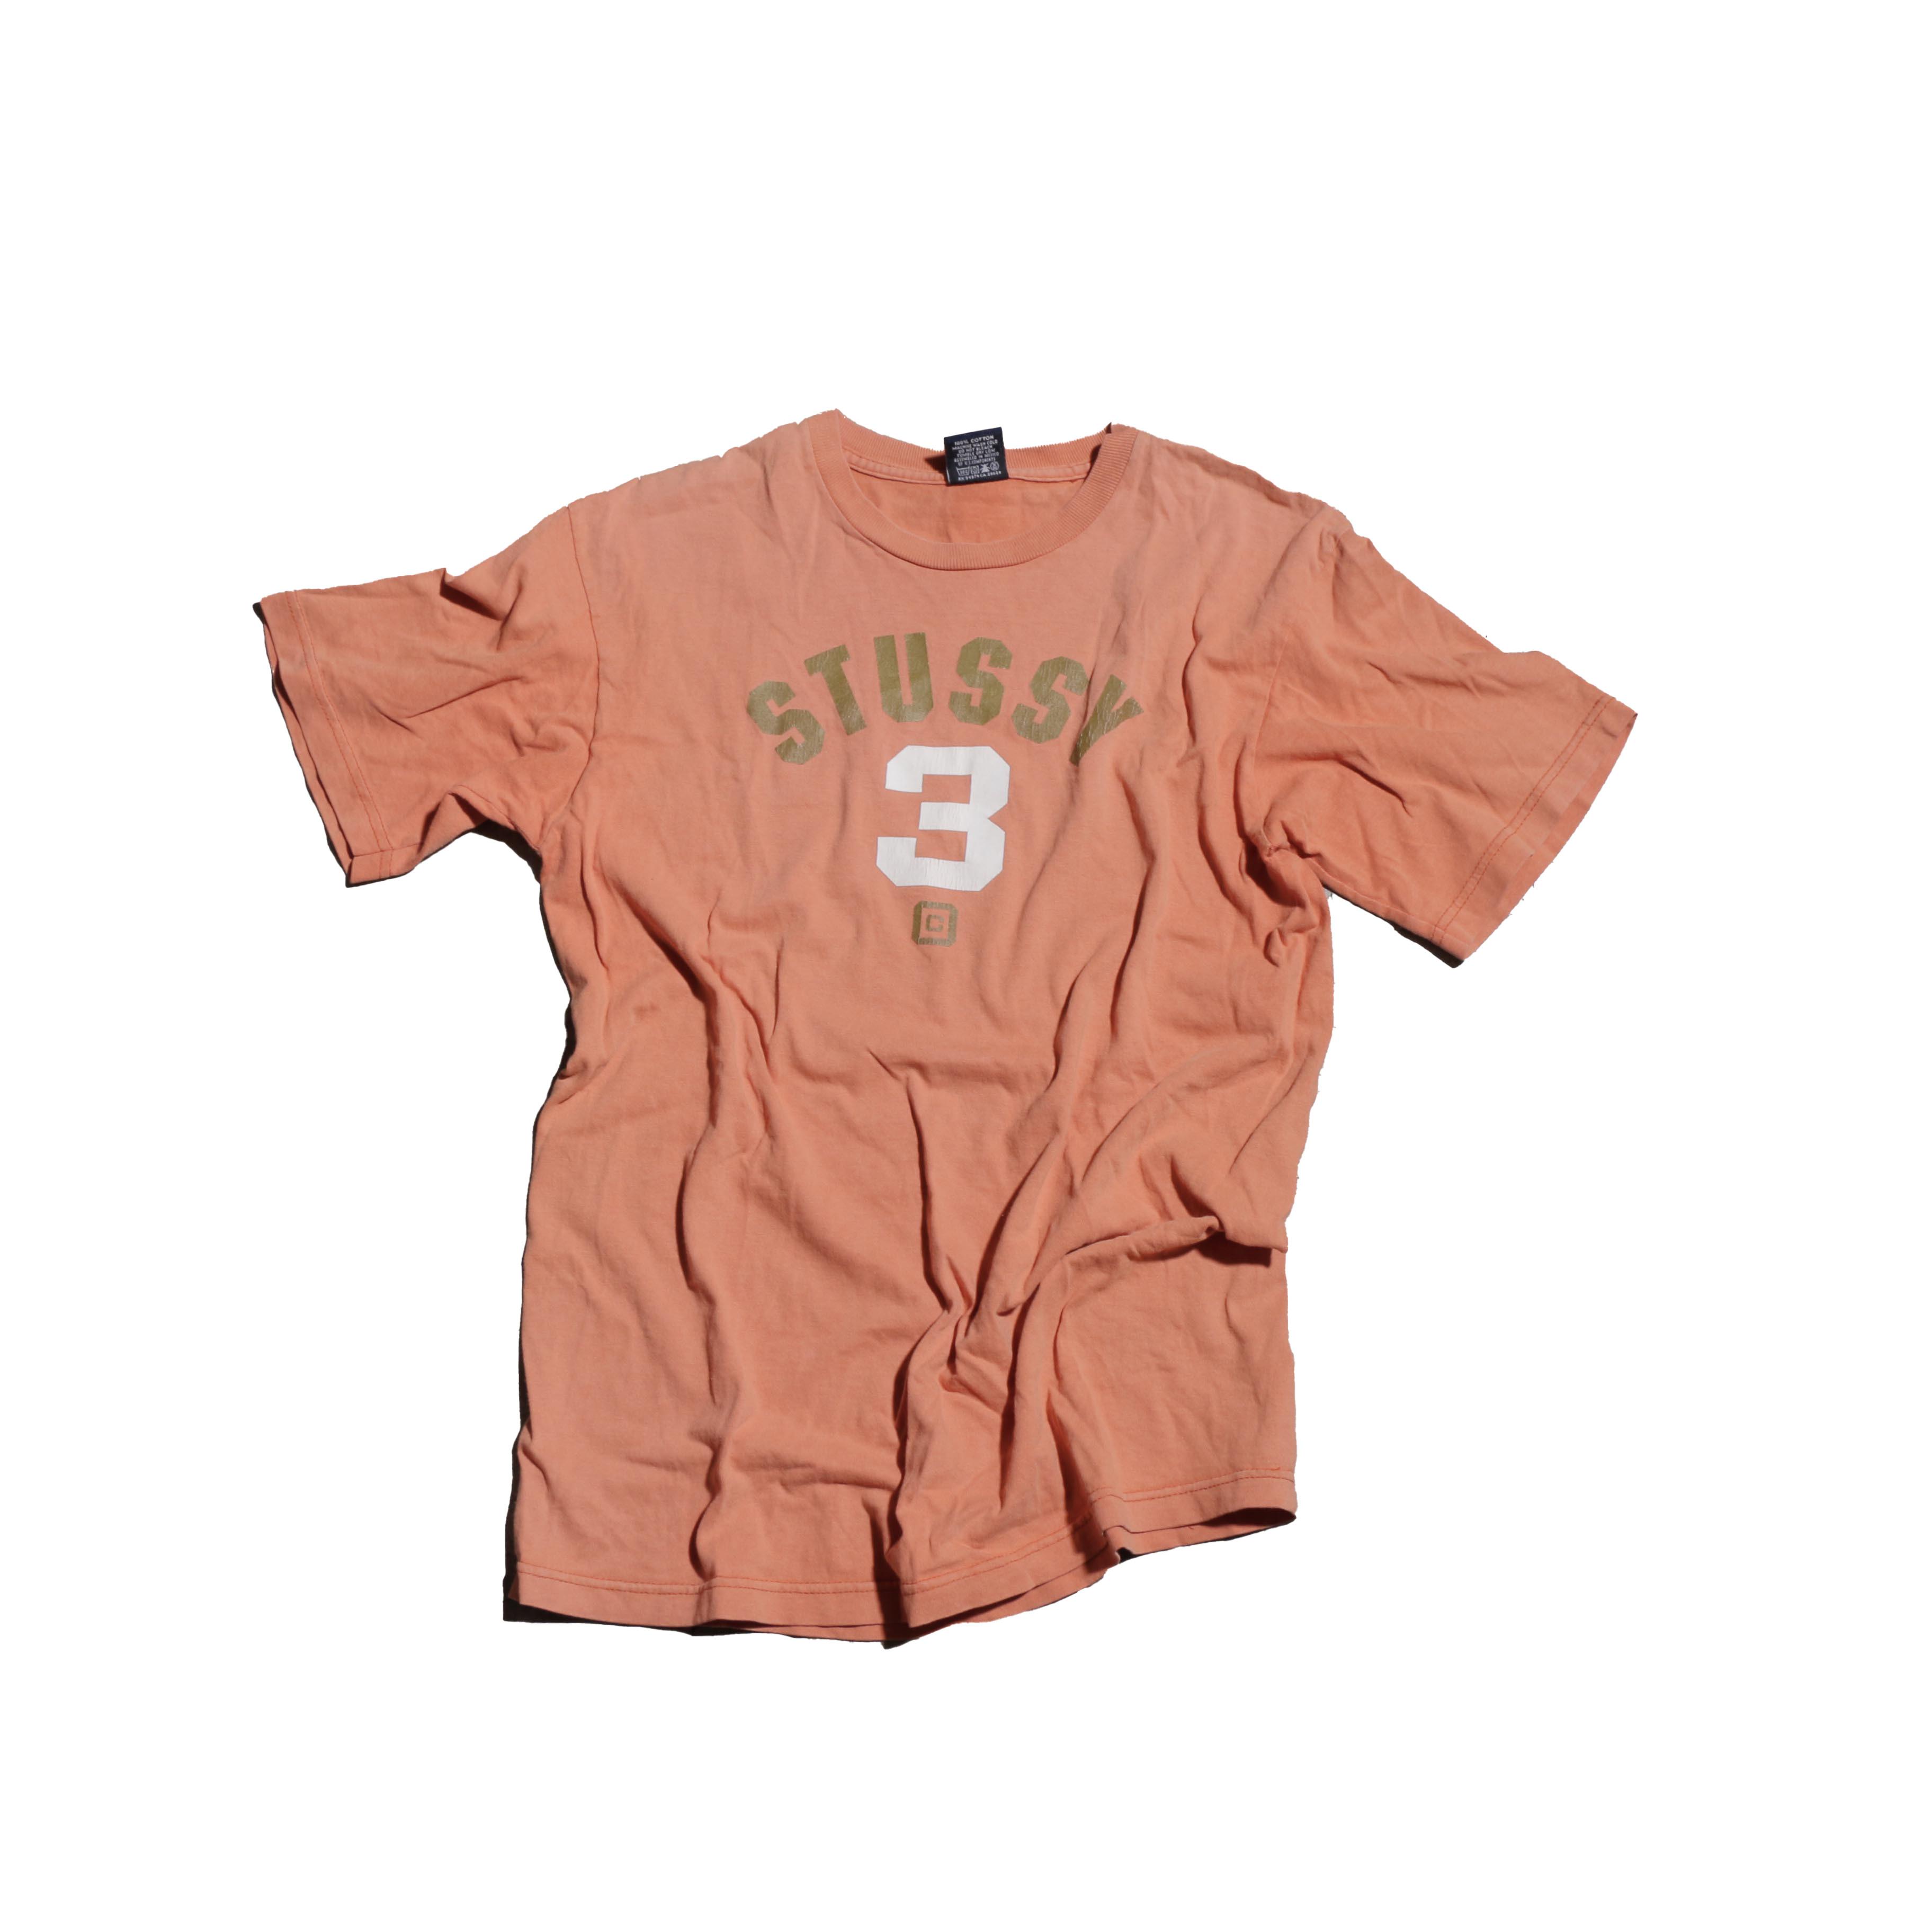 Stussy NumberingT-Shirts